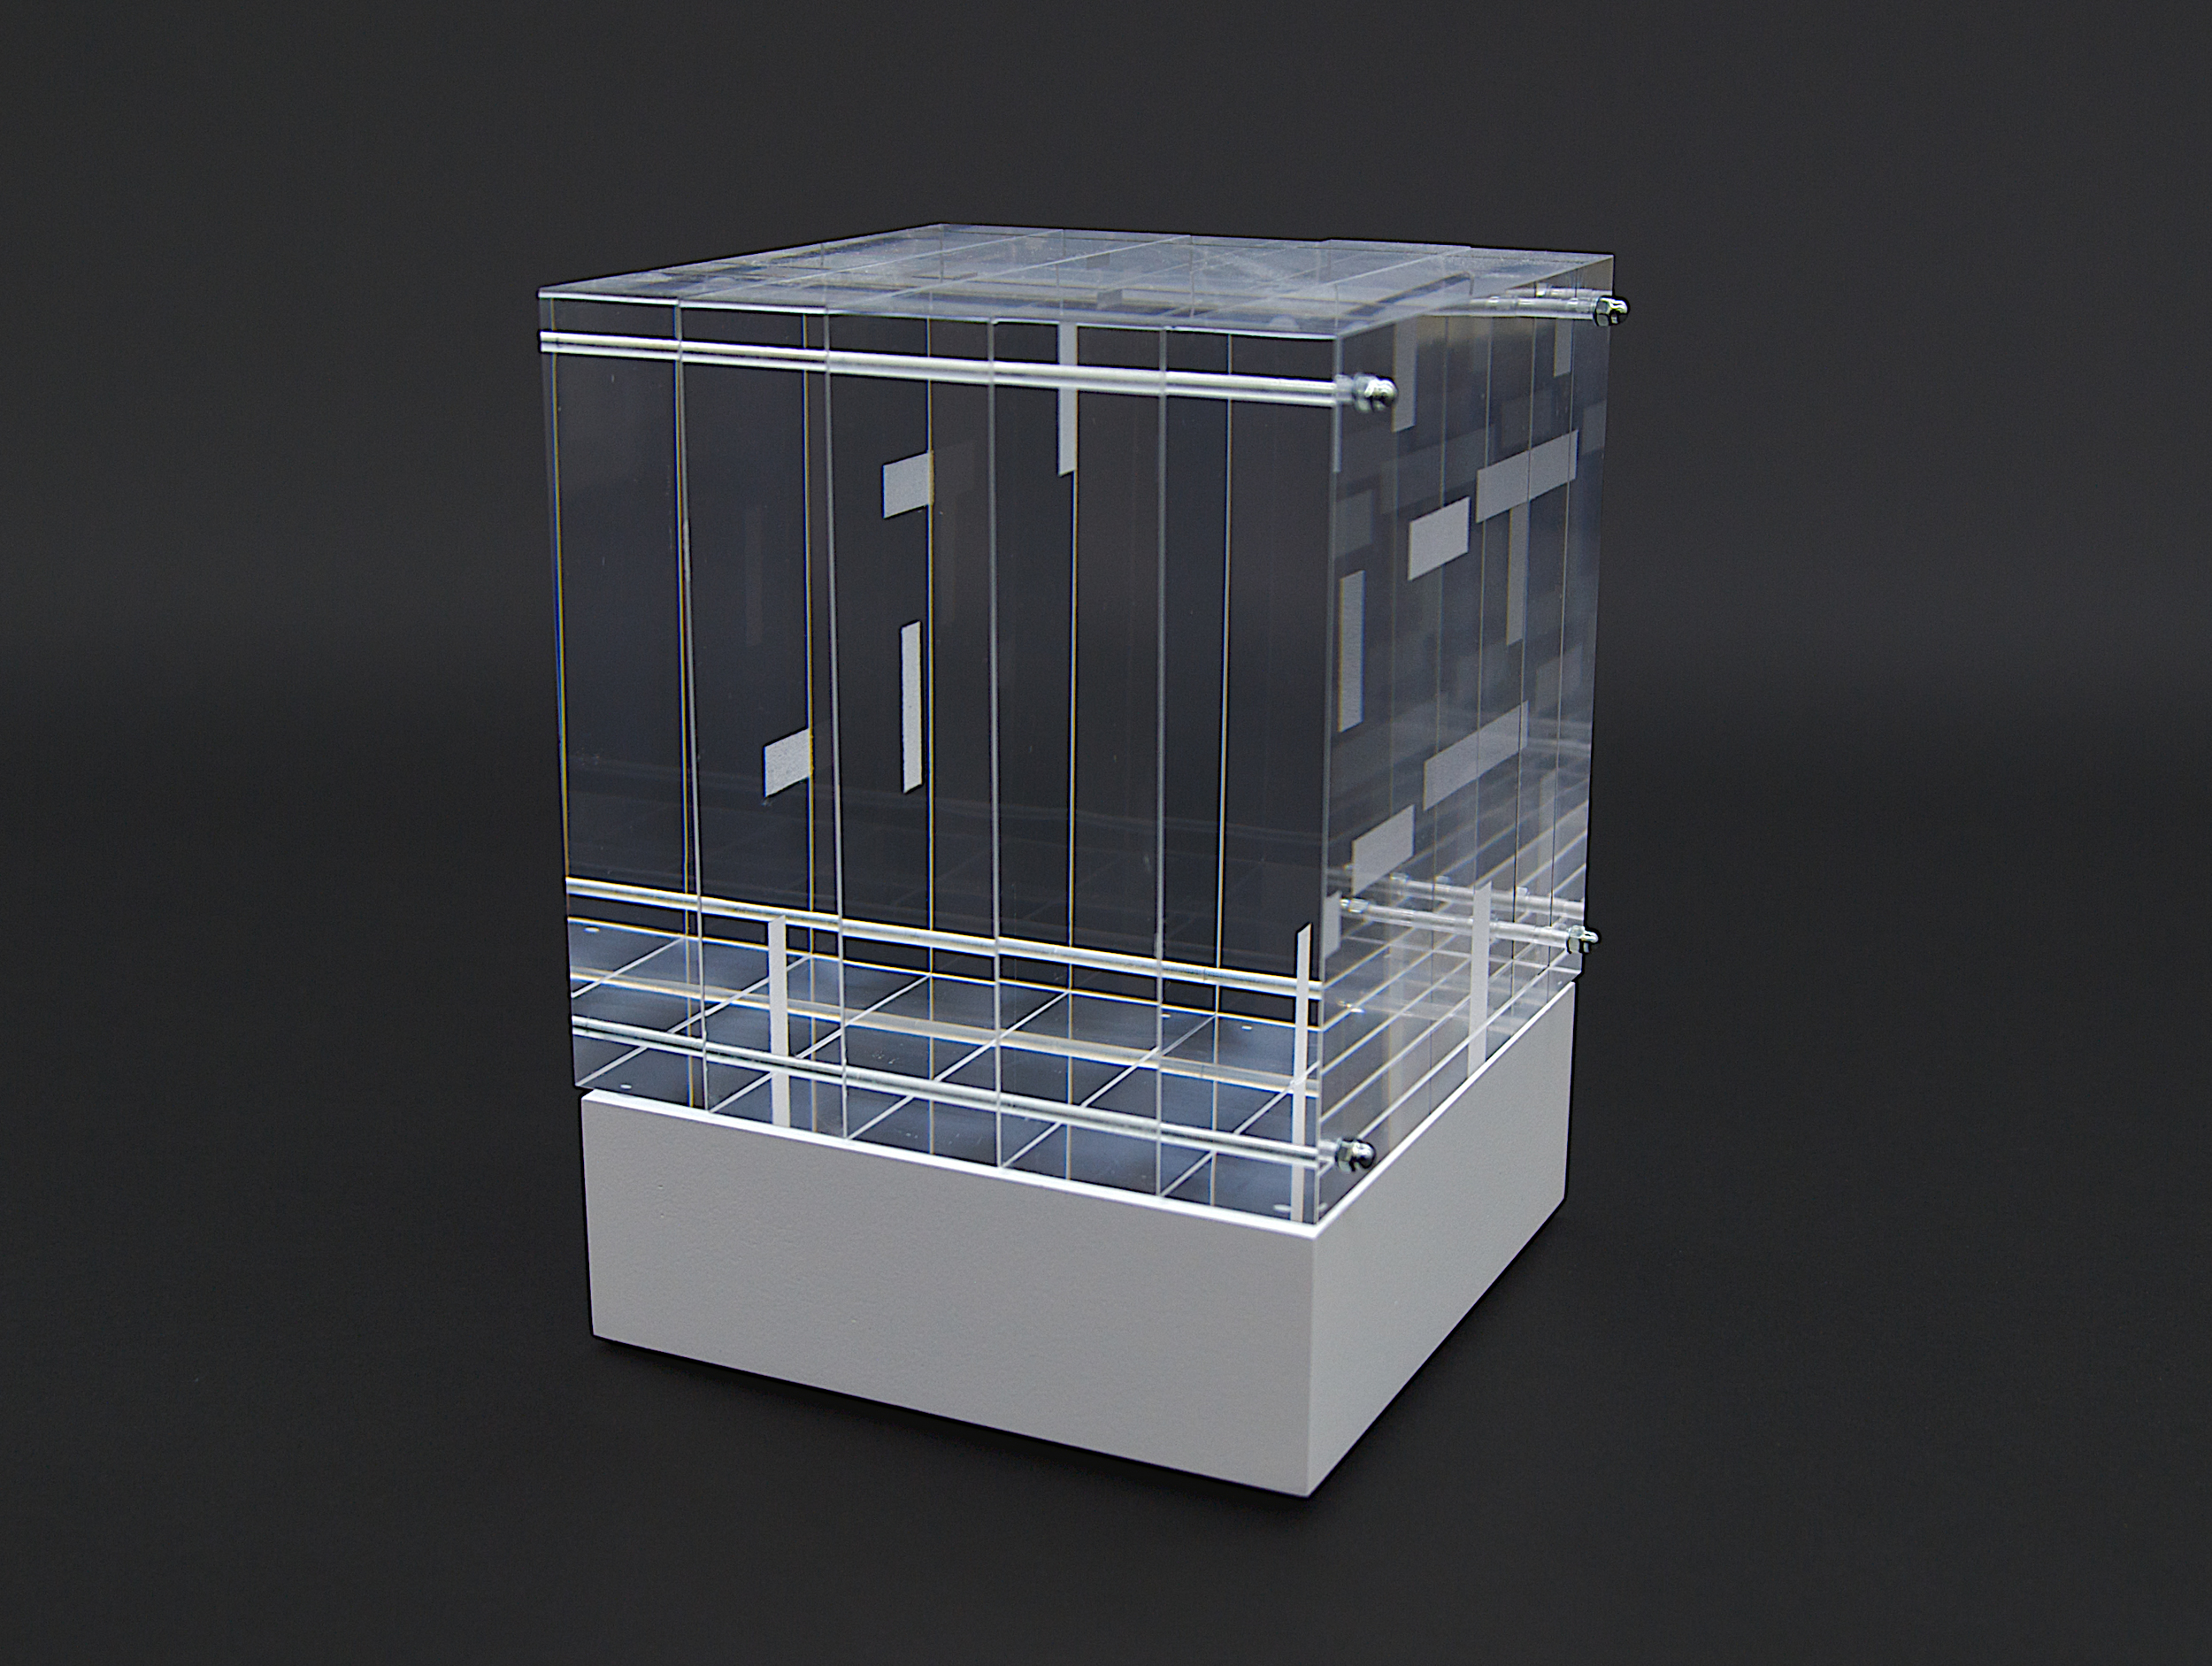 objekt nr. 06/2011 - acrylglas bemalt - 15 x 15 x 15 cmauf drehbarem sockel